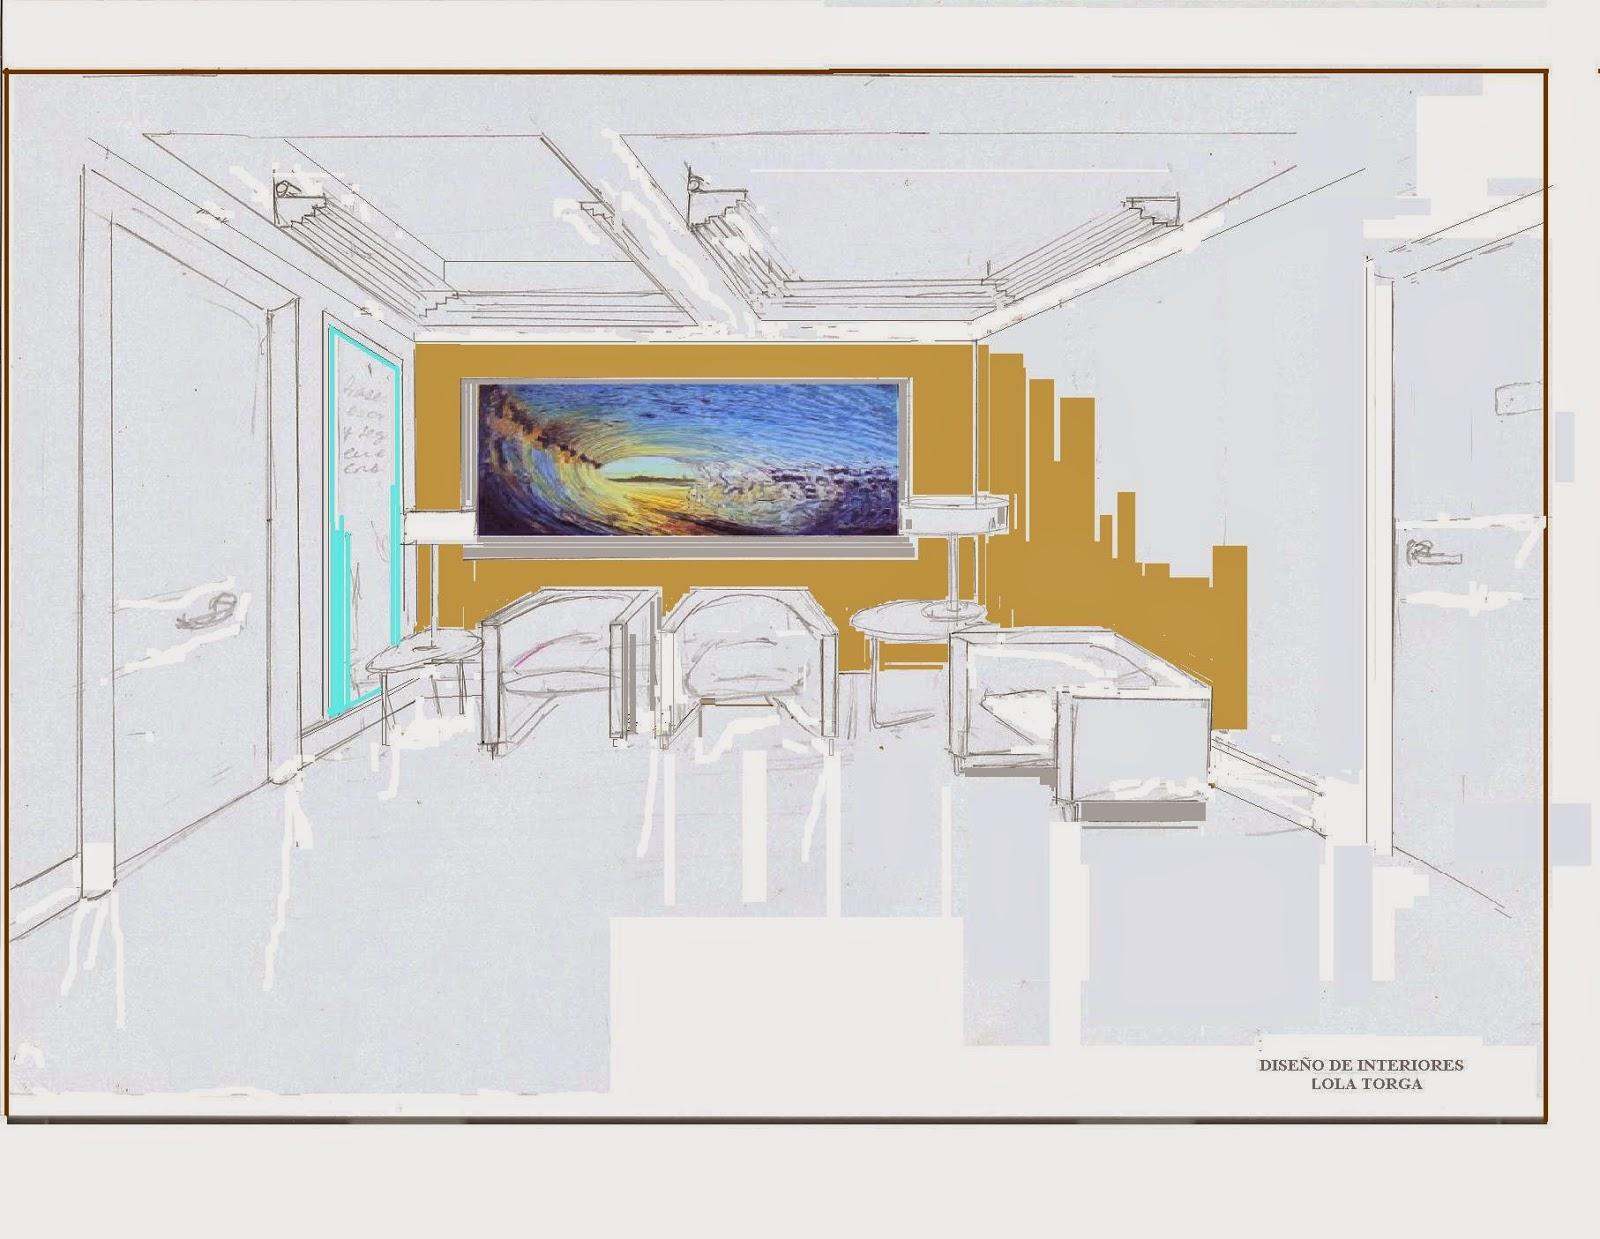 Clinica psicólogos diseño.decoracion